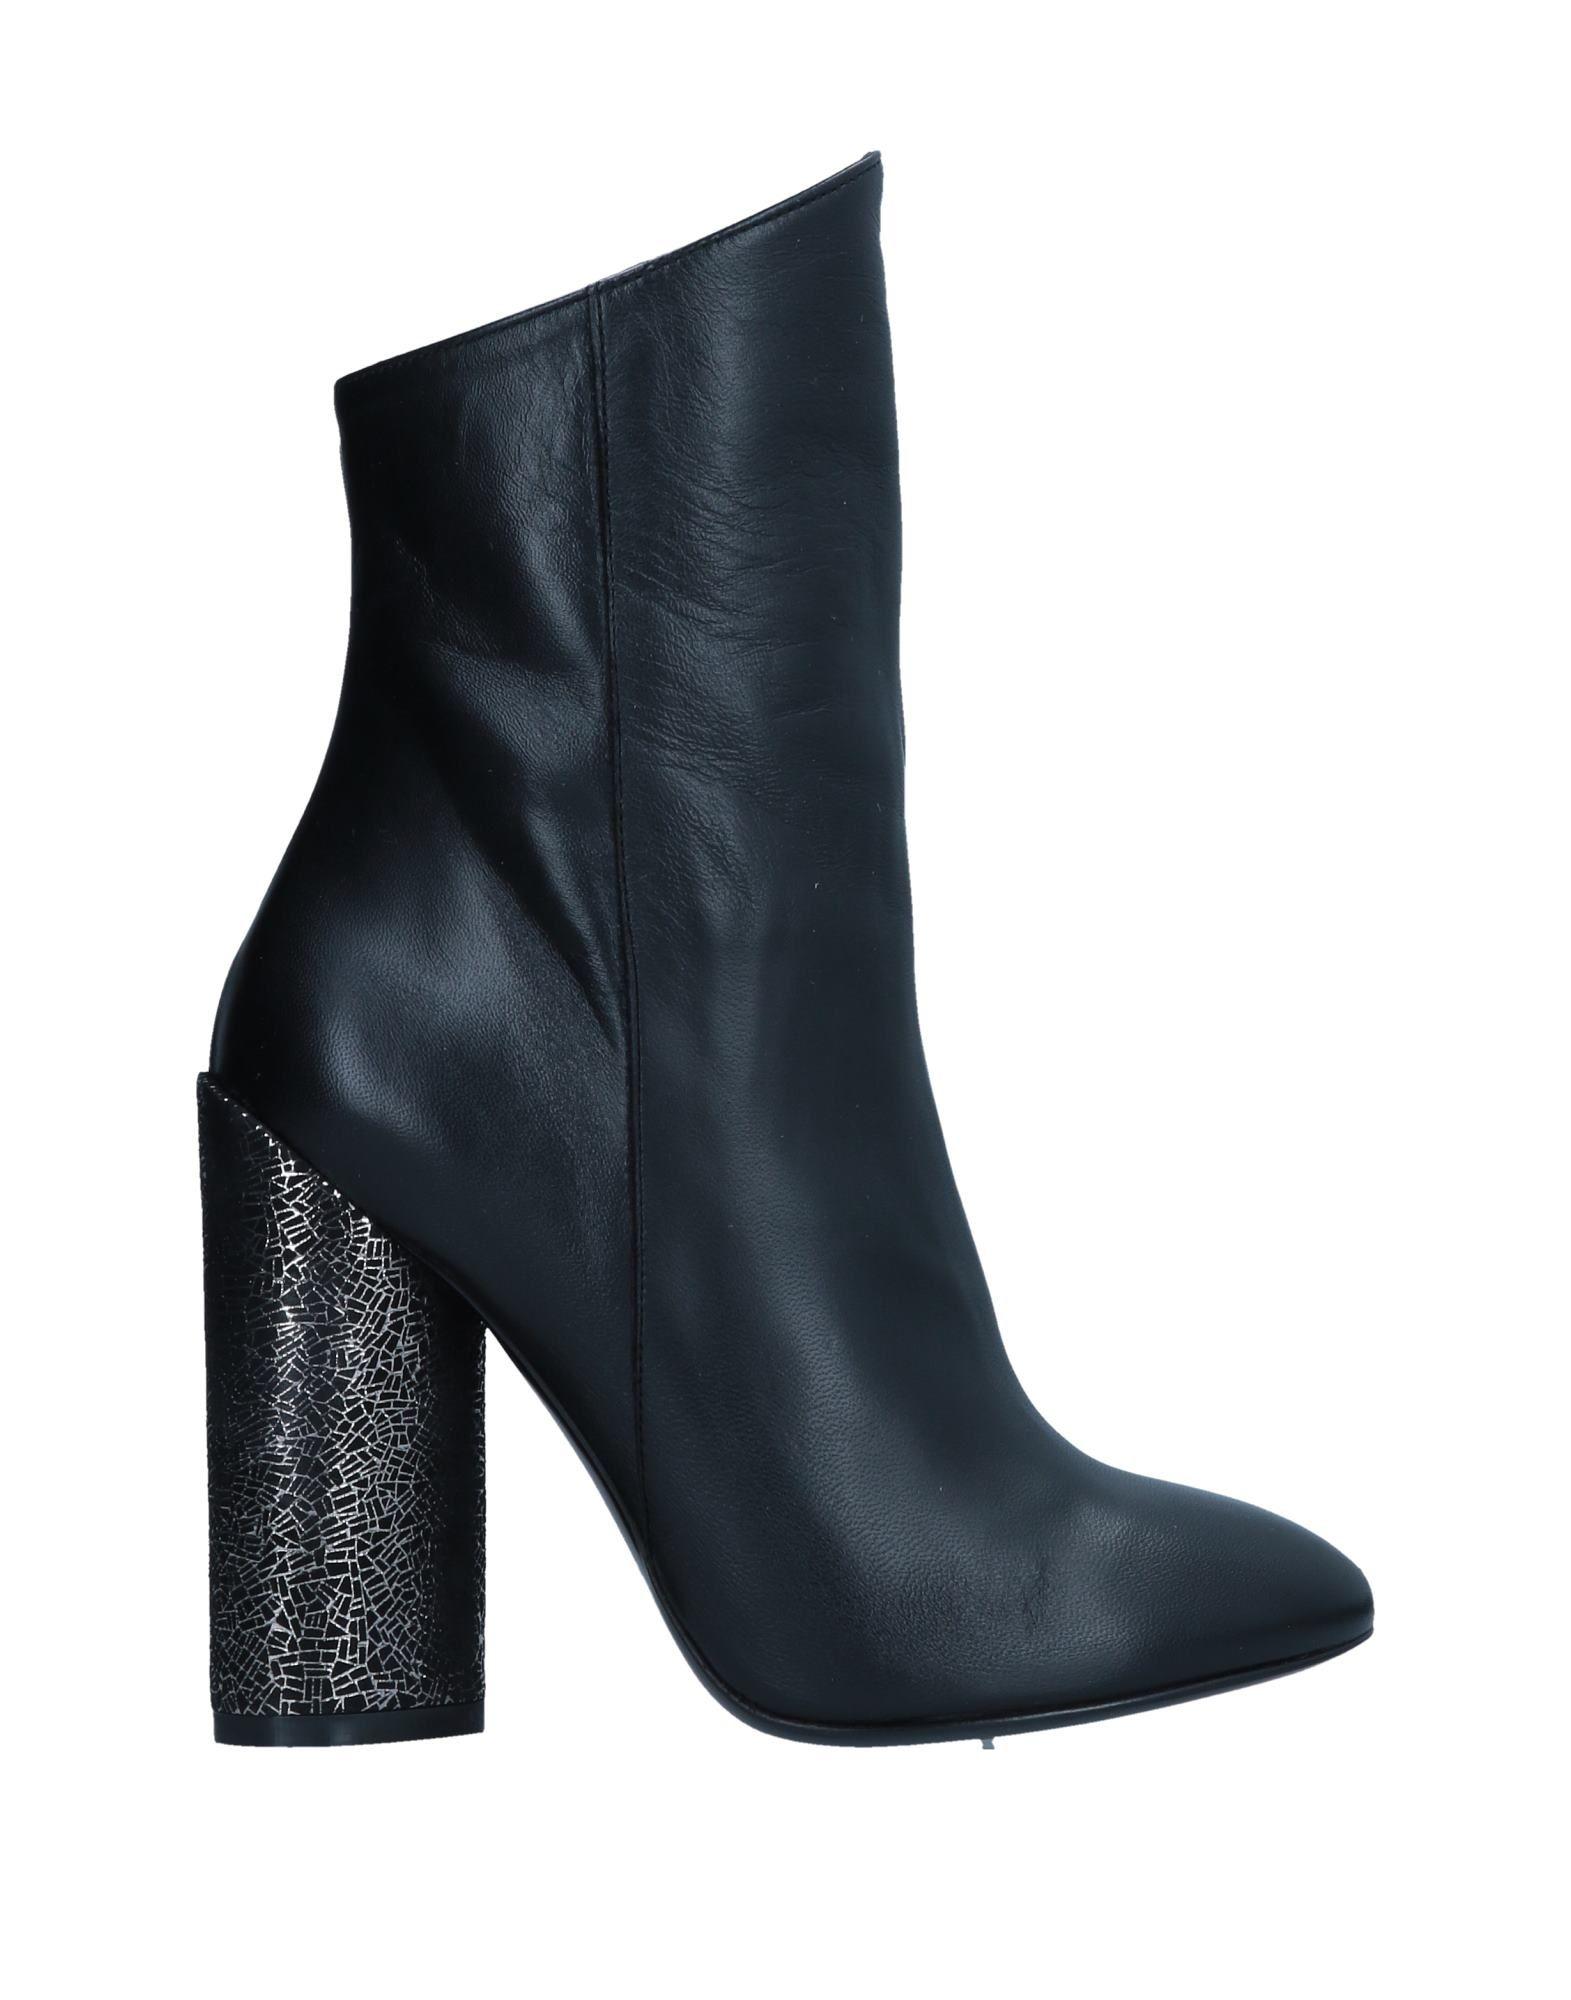 new product 16510 dfeef Bottine Parents Femme - Bottines Parents Noir Chaussures casual sauvages